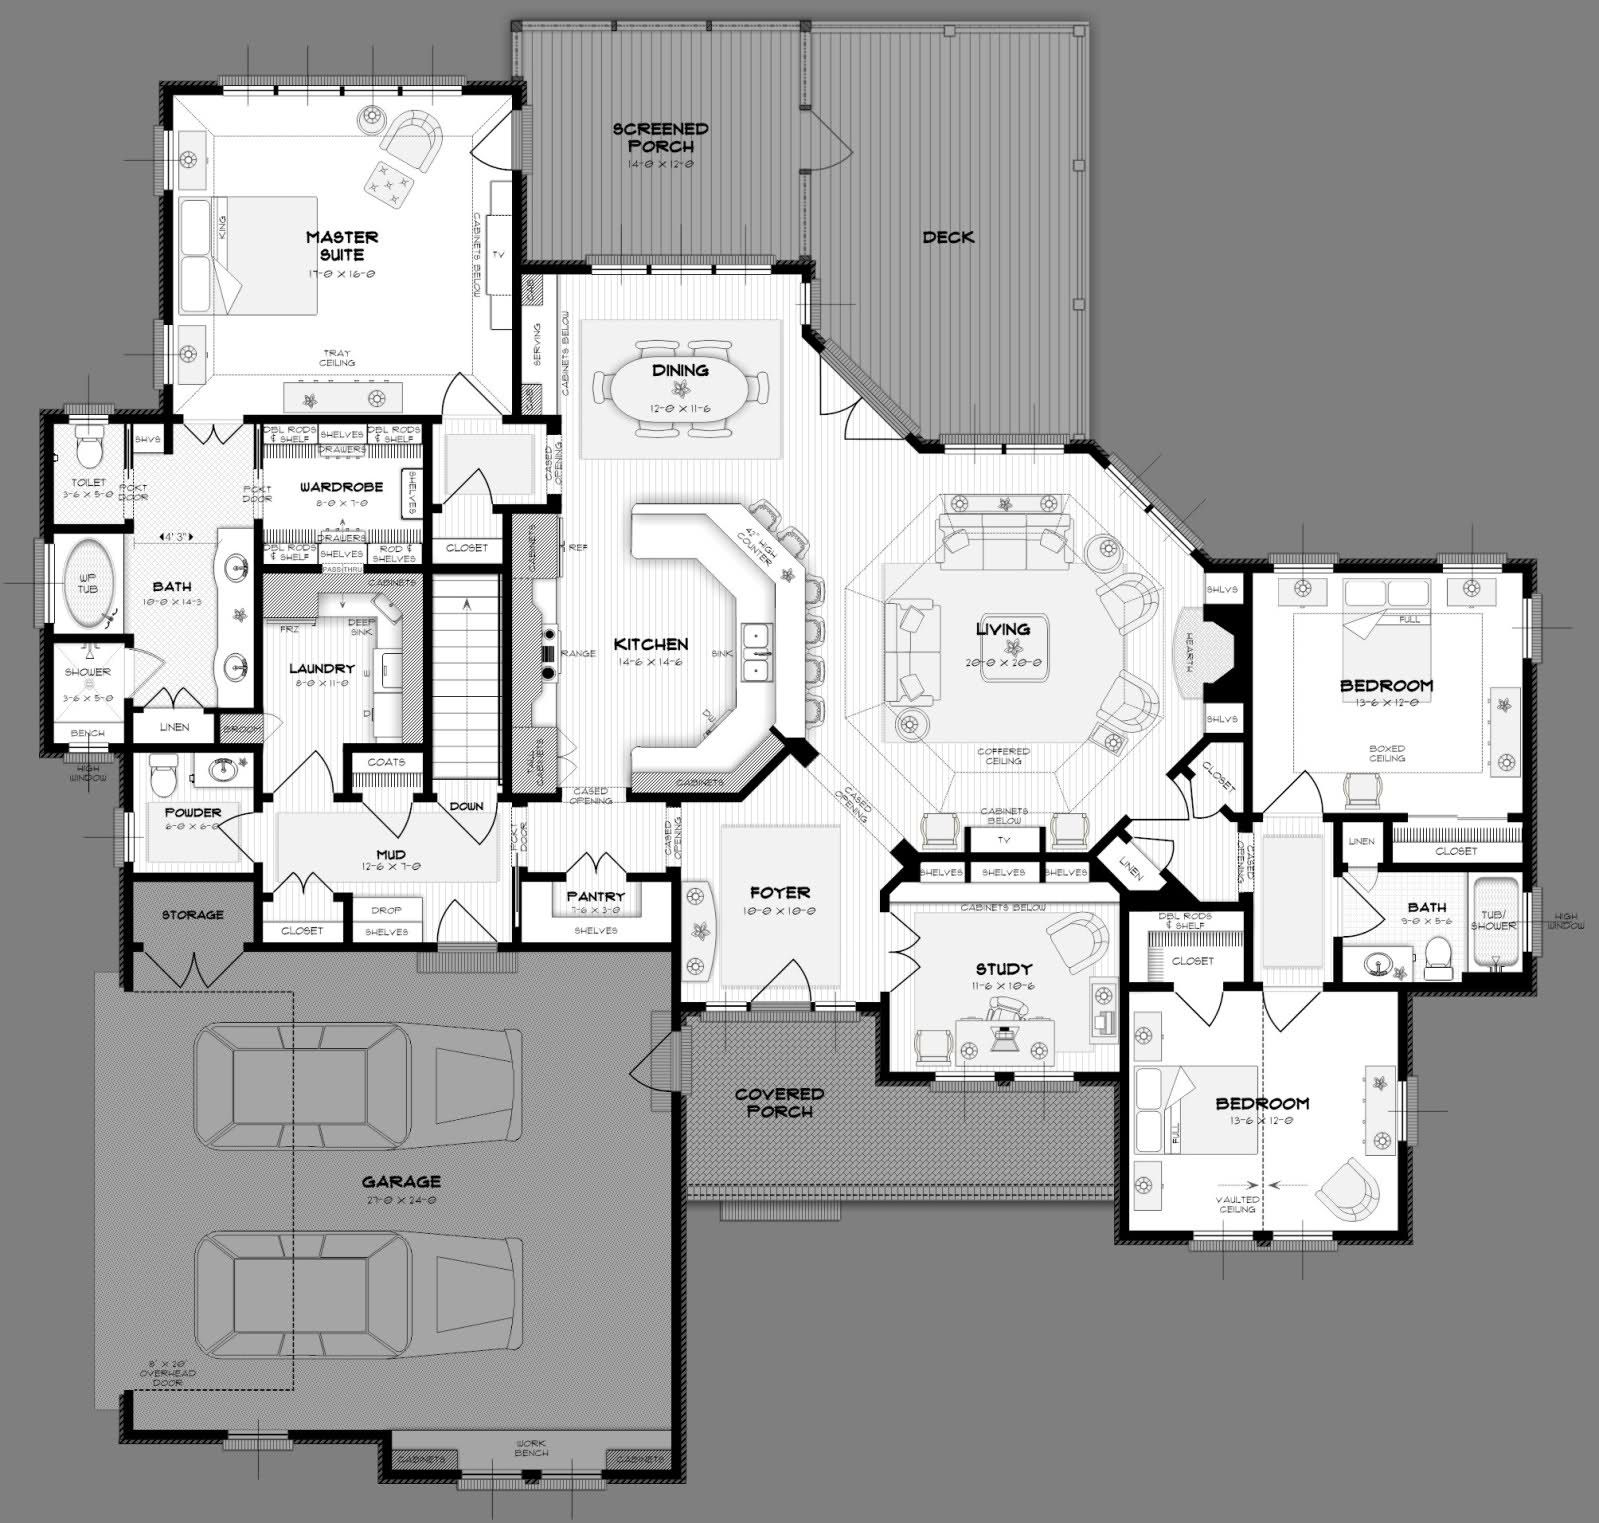 Summerfield Design On Gardenweb Floor Plans In 2018 Pinterest Seeking Advice For A Three Way Electrical Wiring Forum